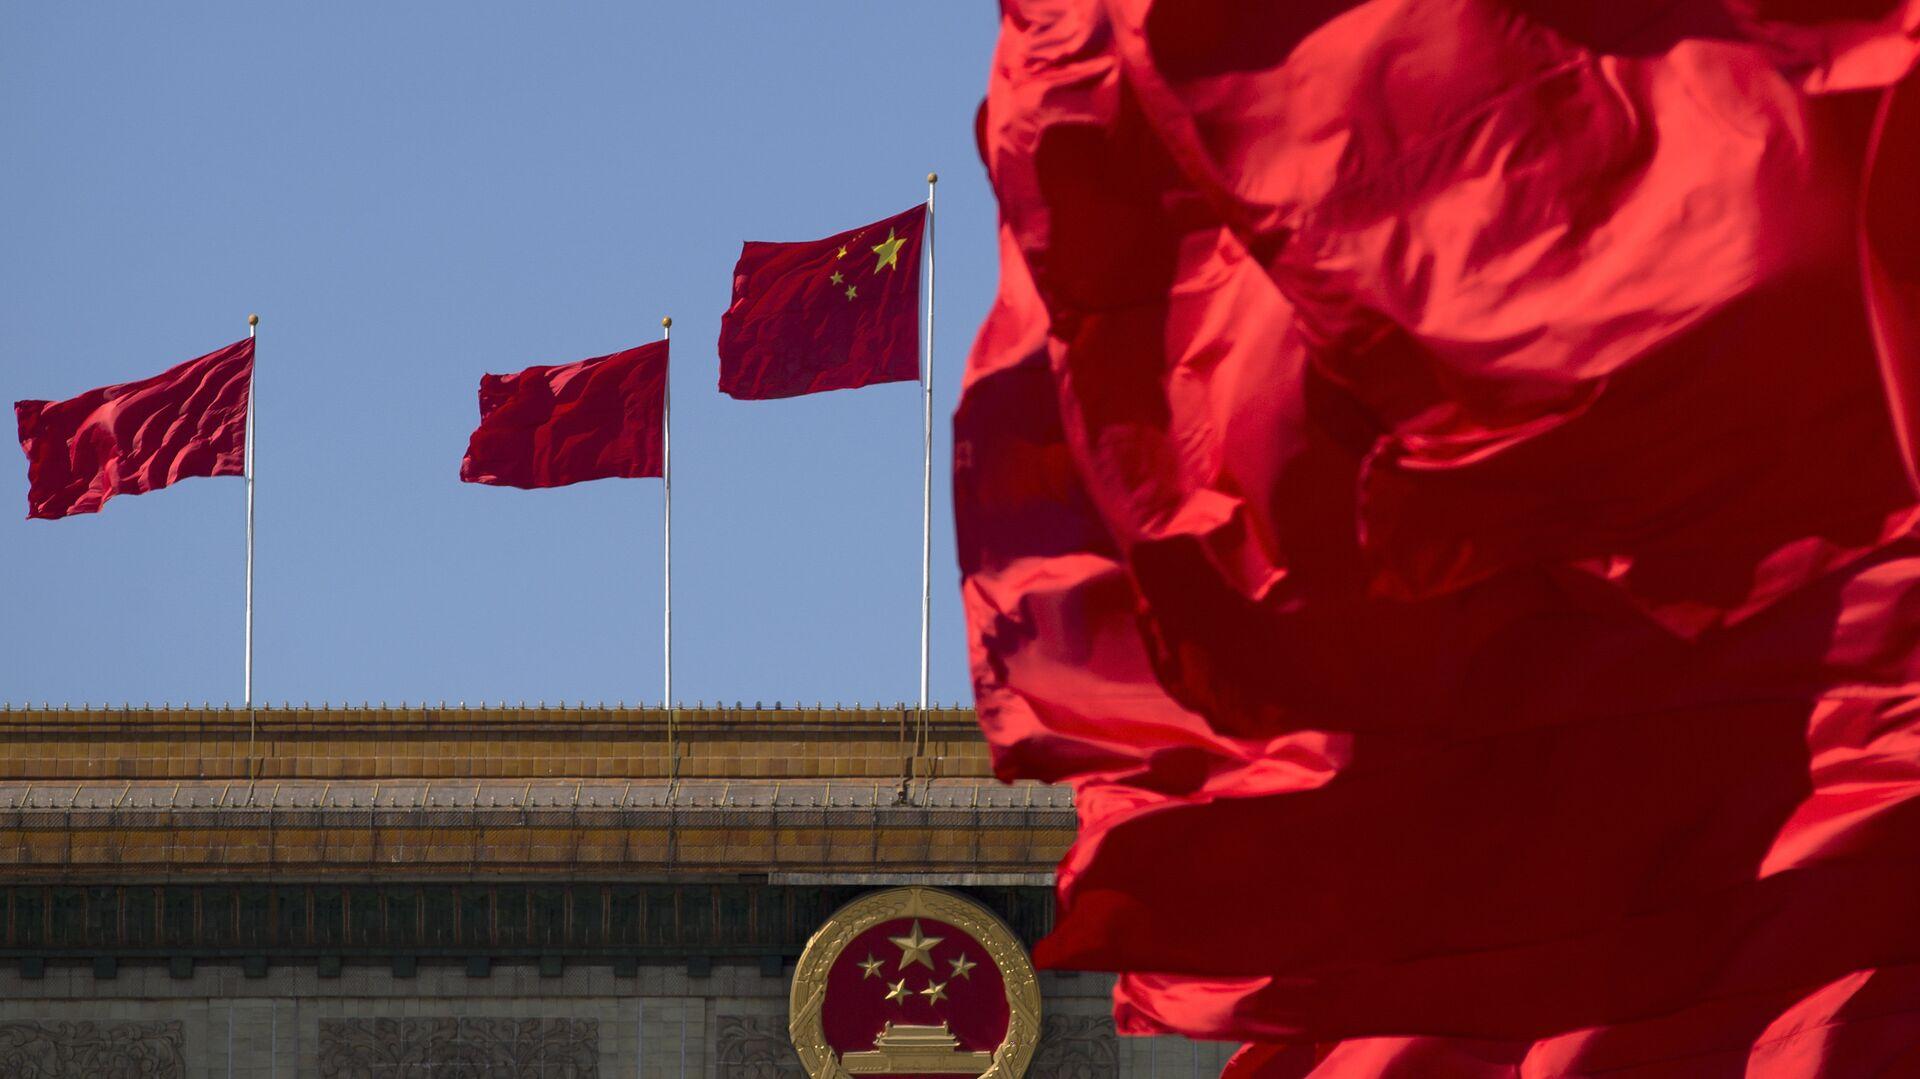 La bandera nacional de China - Sputnik Mundo, 1920, 25.03.2021